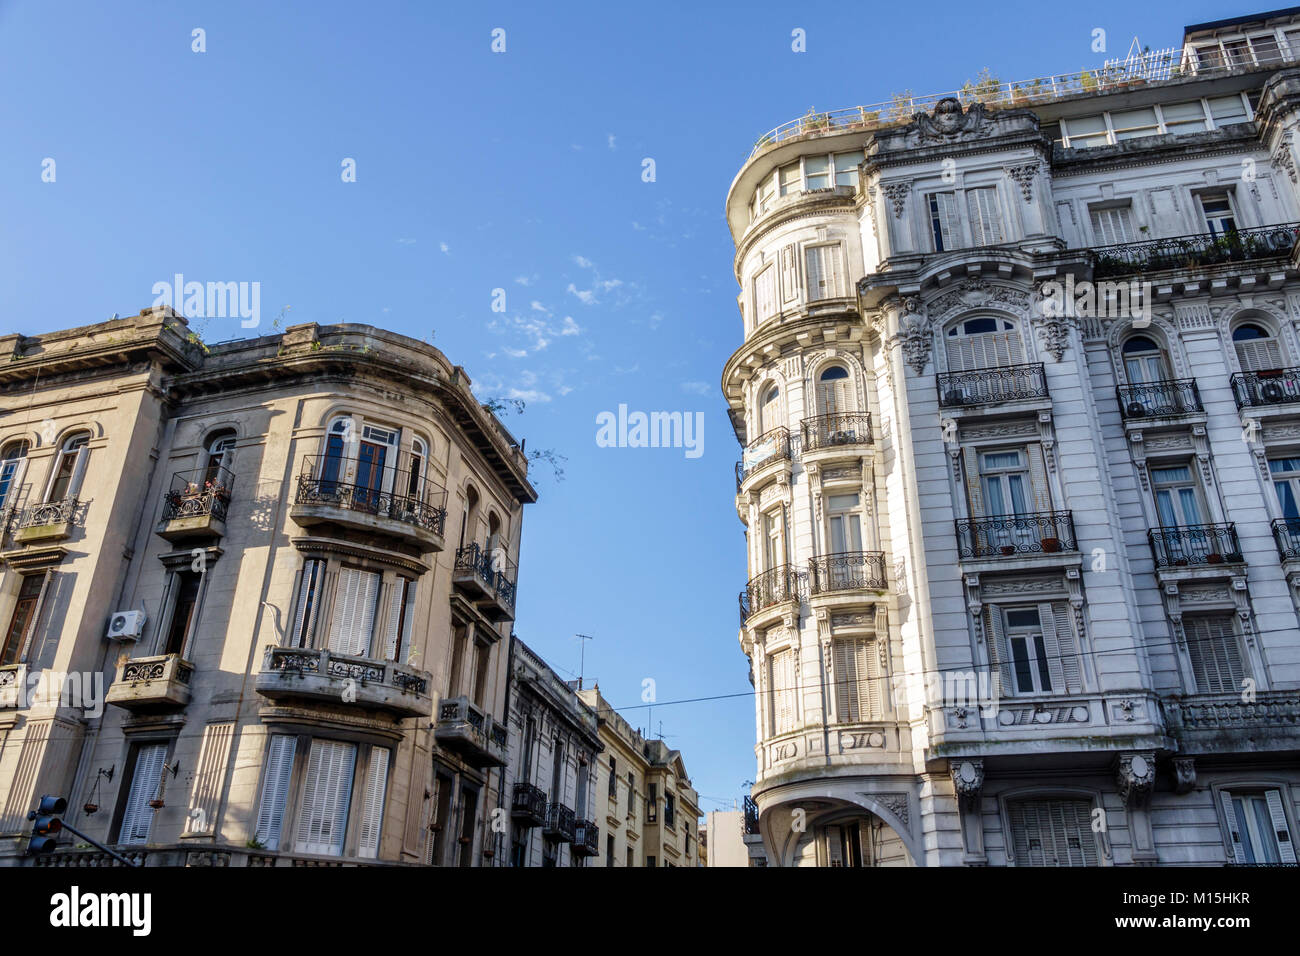 Buenos Aires Argentina San Telmo historic center architecture Belle Epoque rounded corner residential apartment - Stock Image